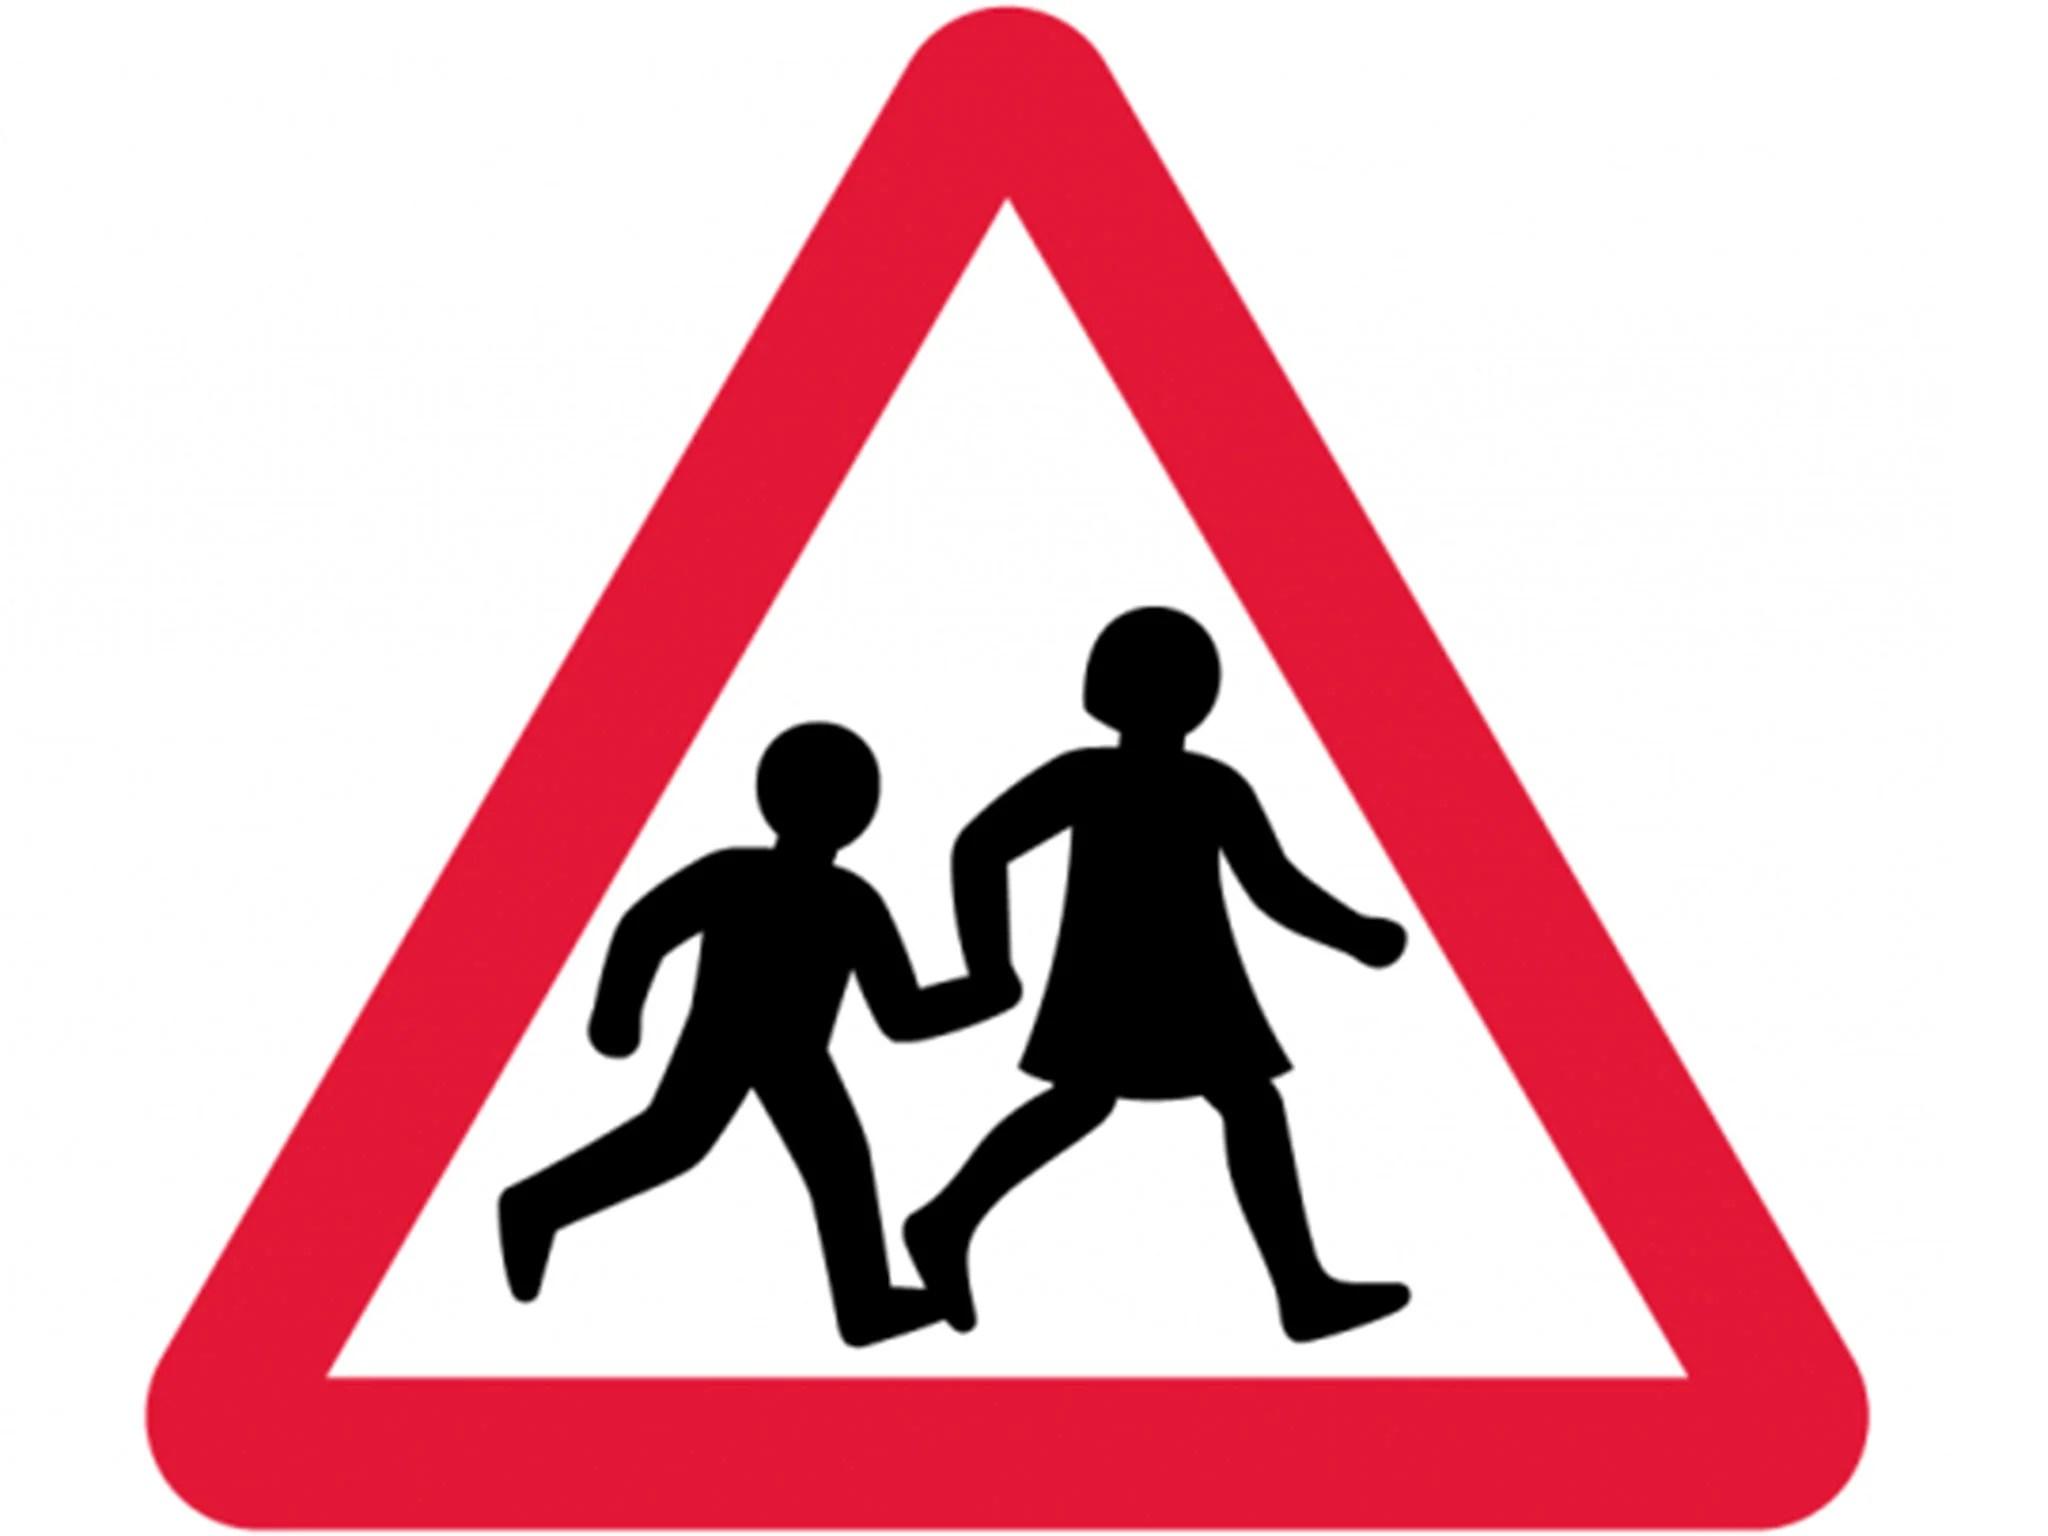 Iconic British Road Sign Of Two Schoolchildren Crossing